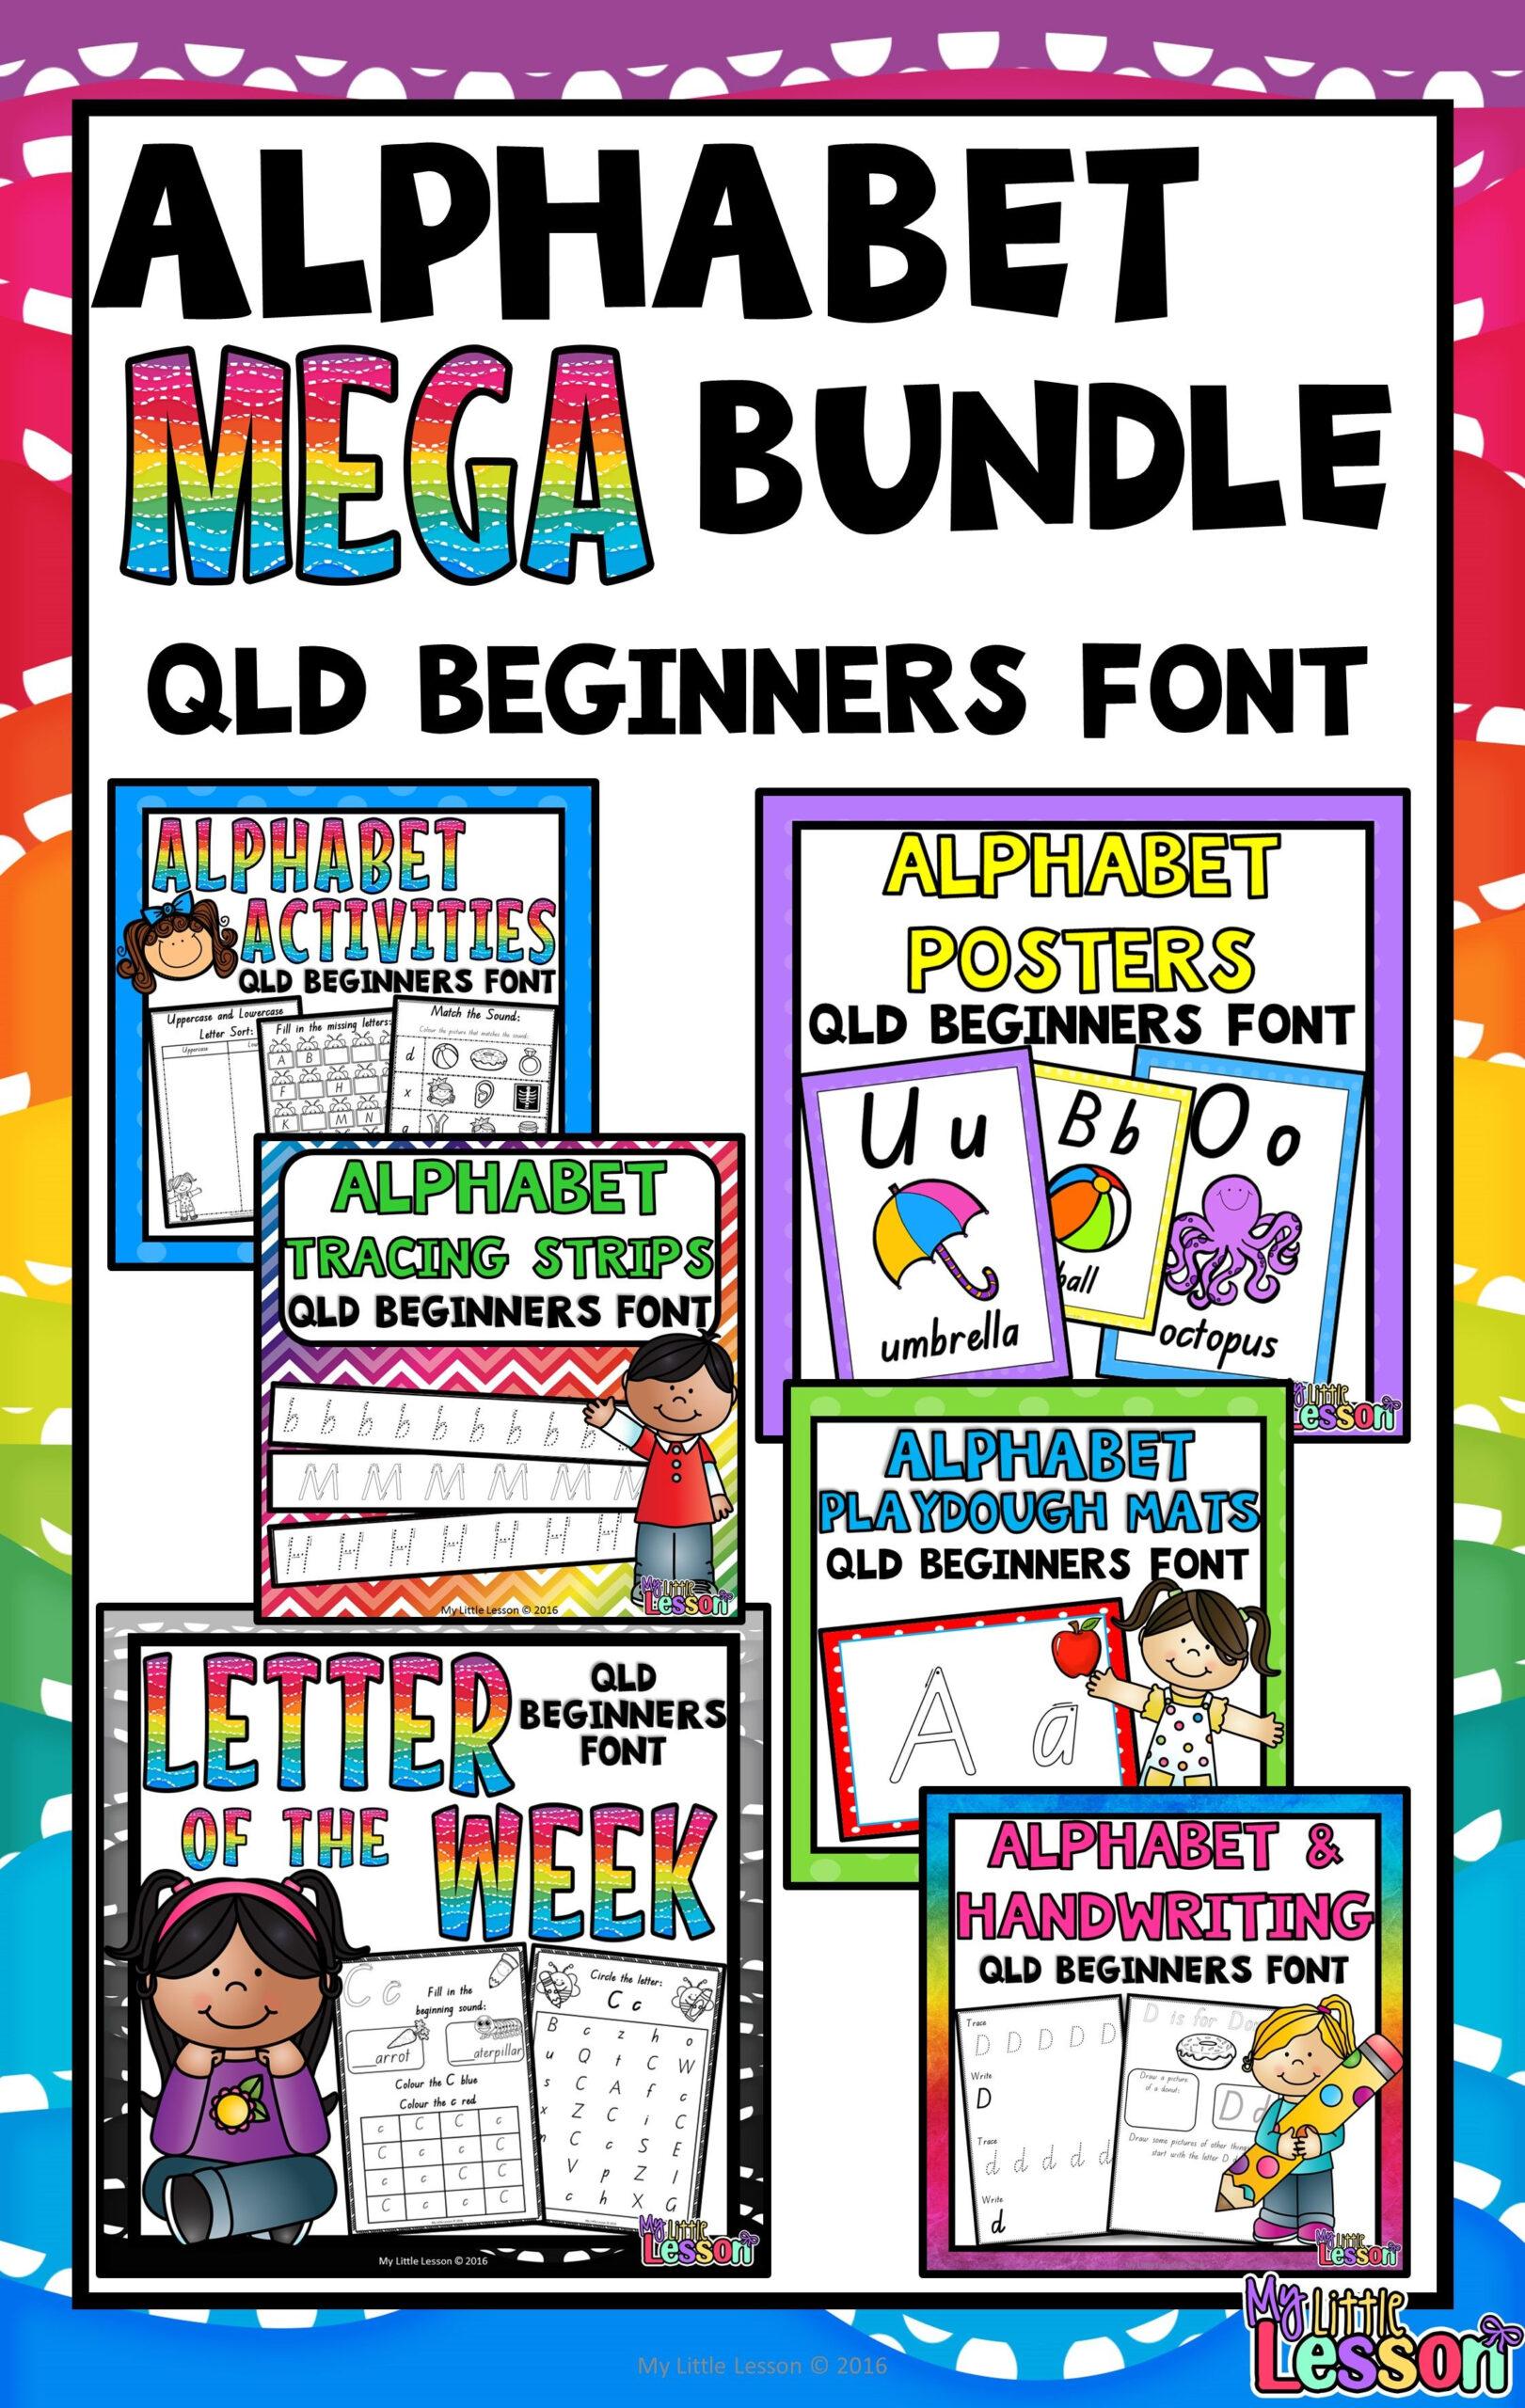 This Alphabet Mega Bundle Qld Beginners Font Includes A